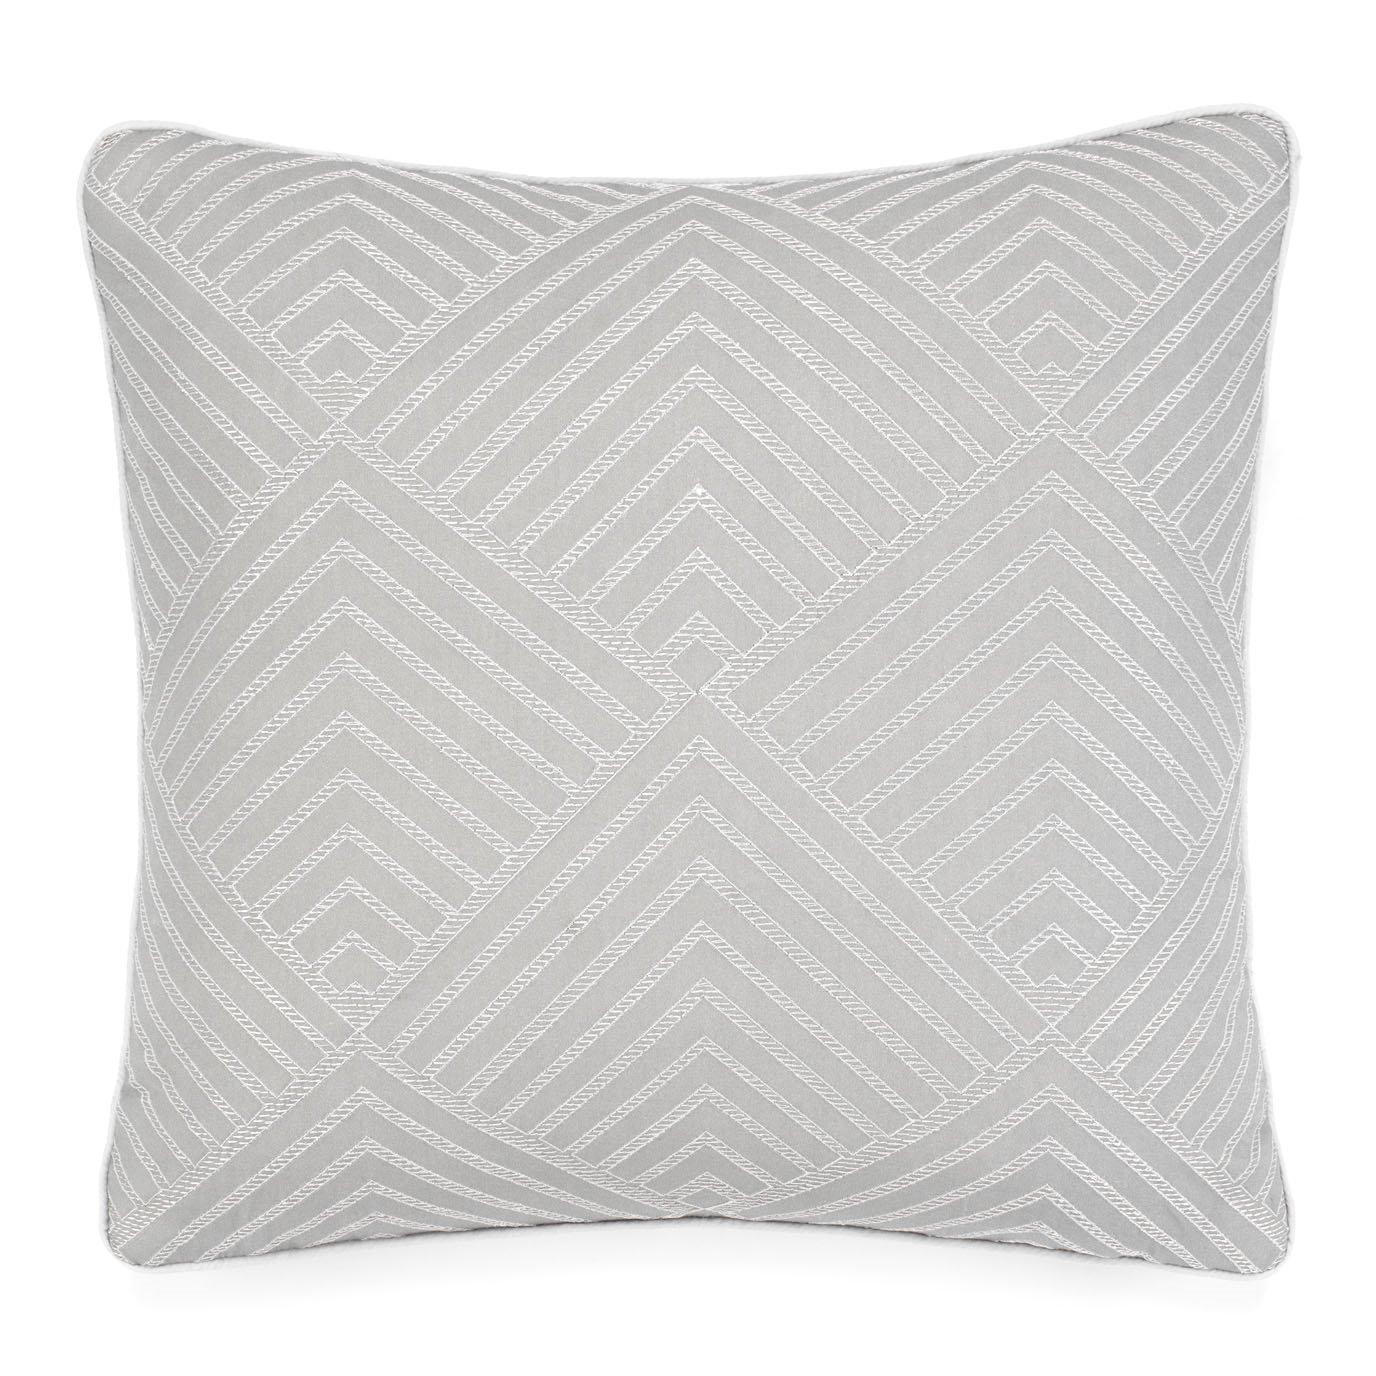 16x16 decorative pillows online